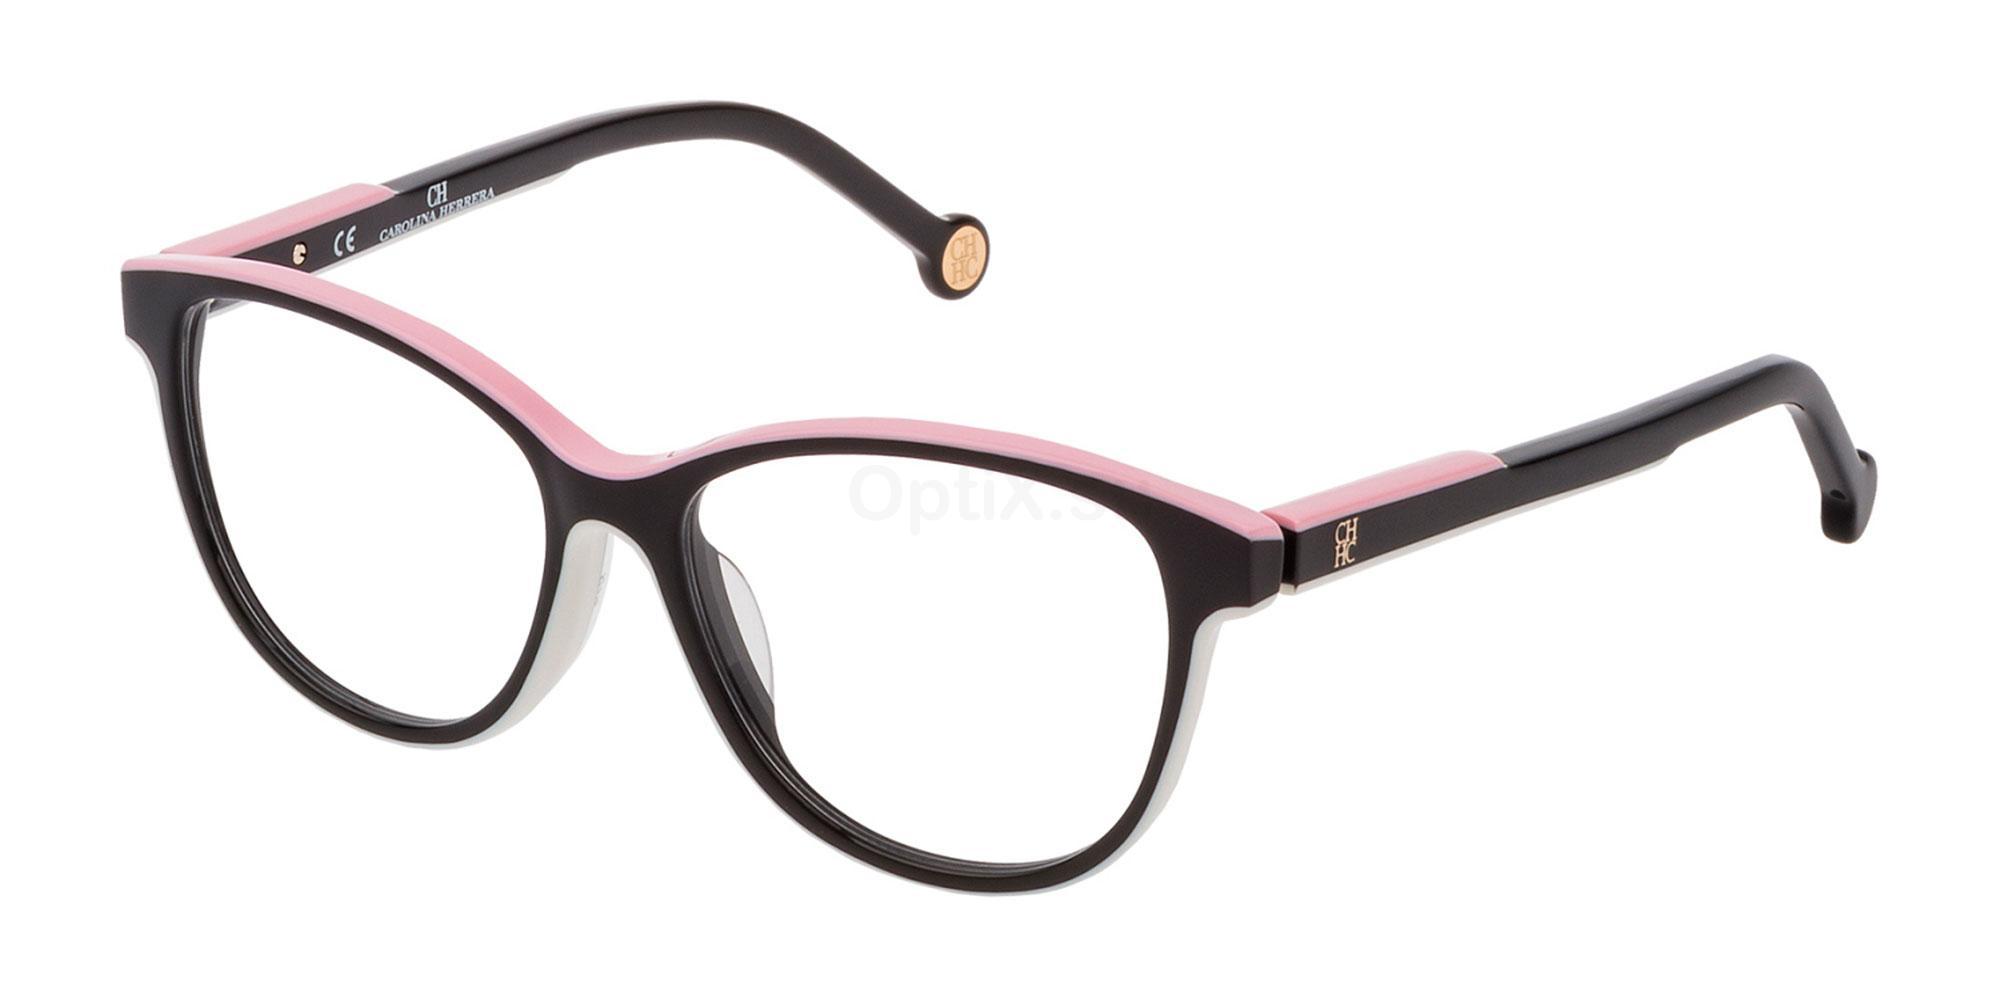 06HC VHE800 Glasses, CH Carolina Herrera